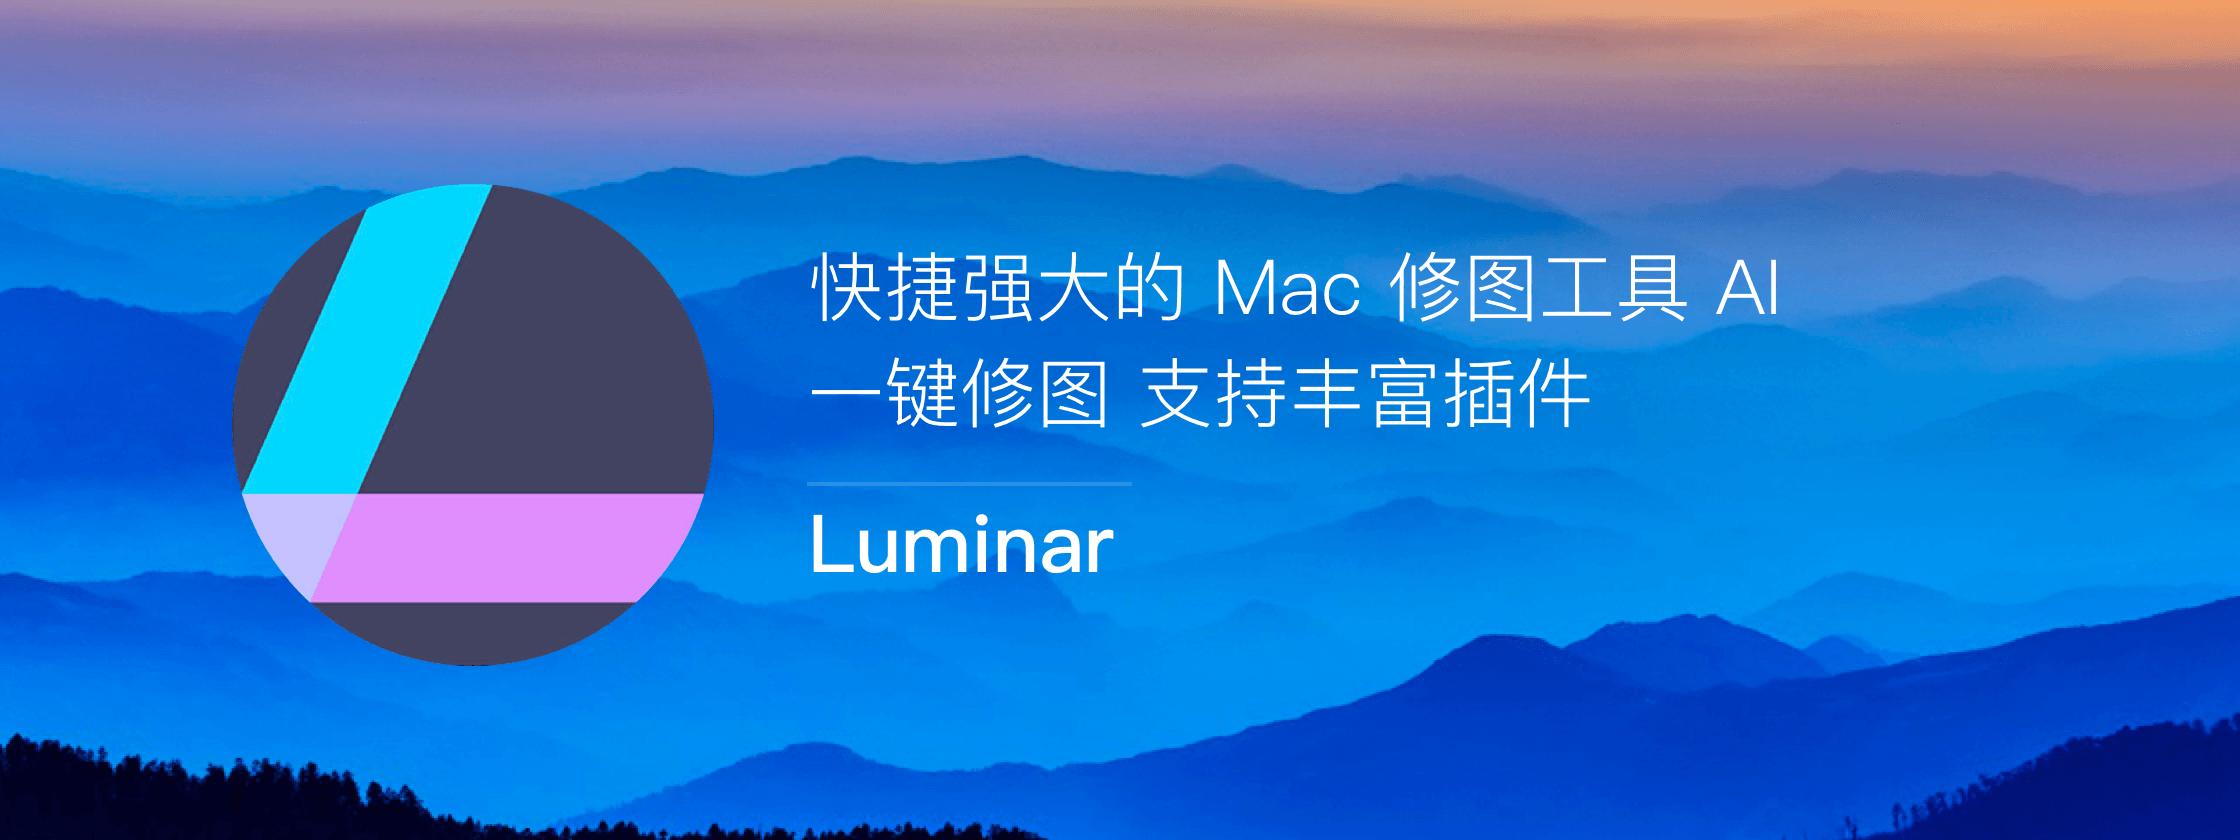 Luminar,让 Mac 也能用人工智能一键修图